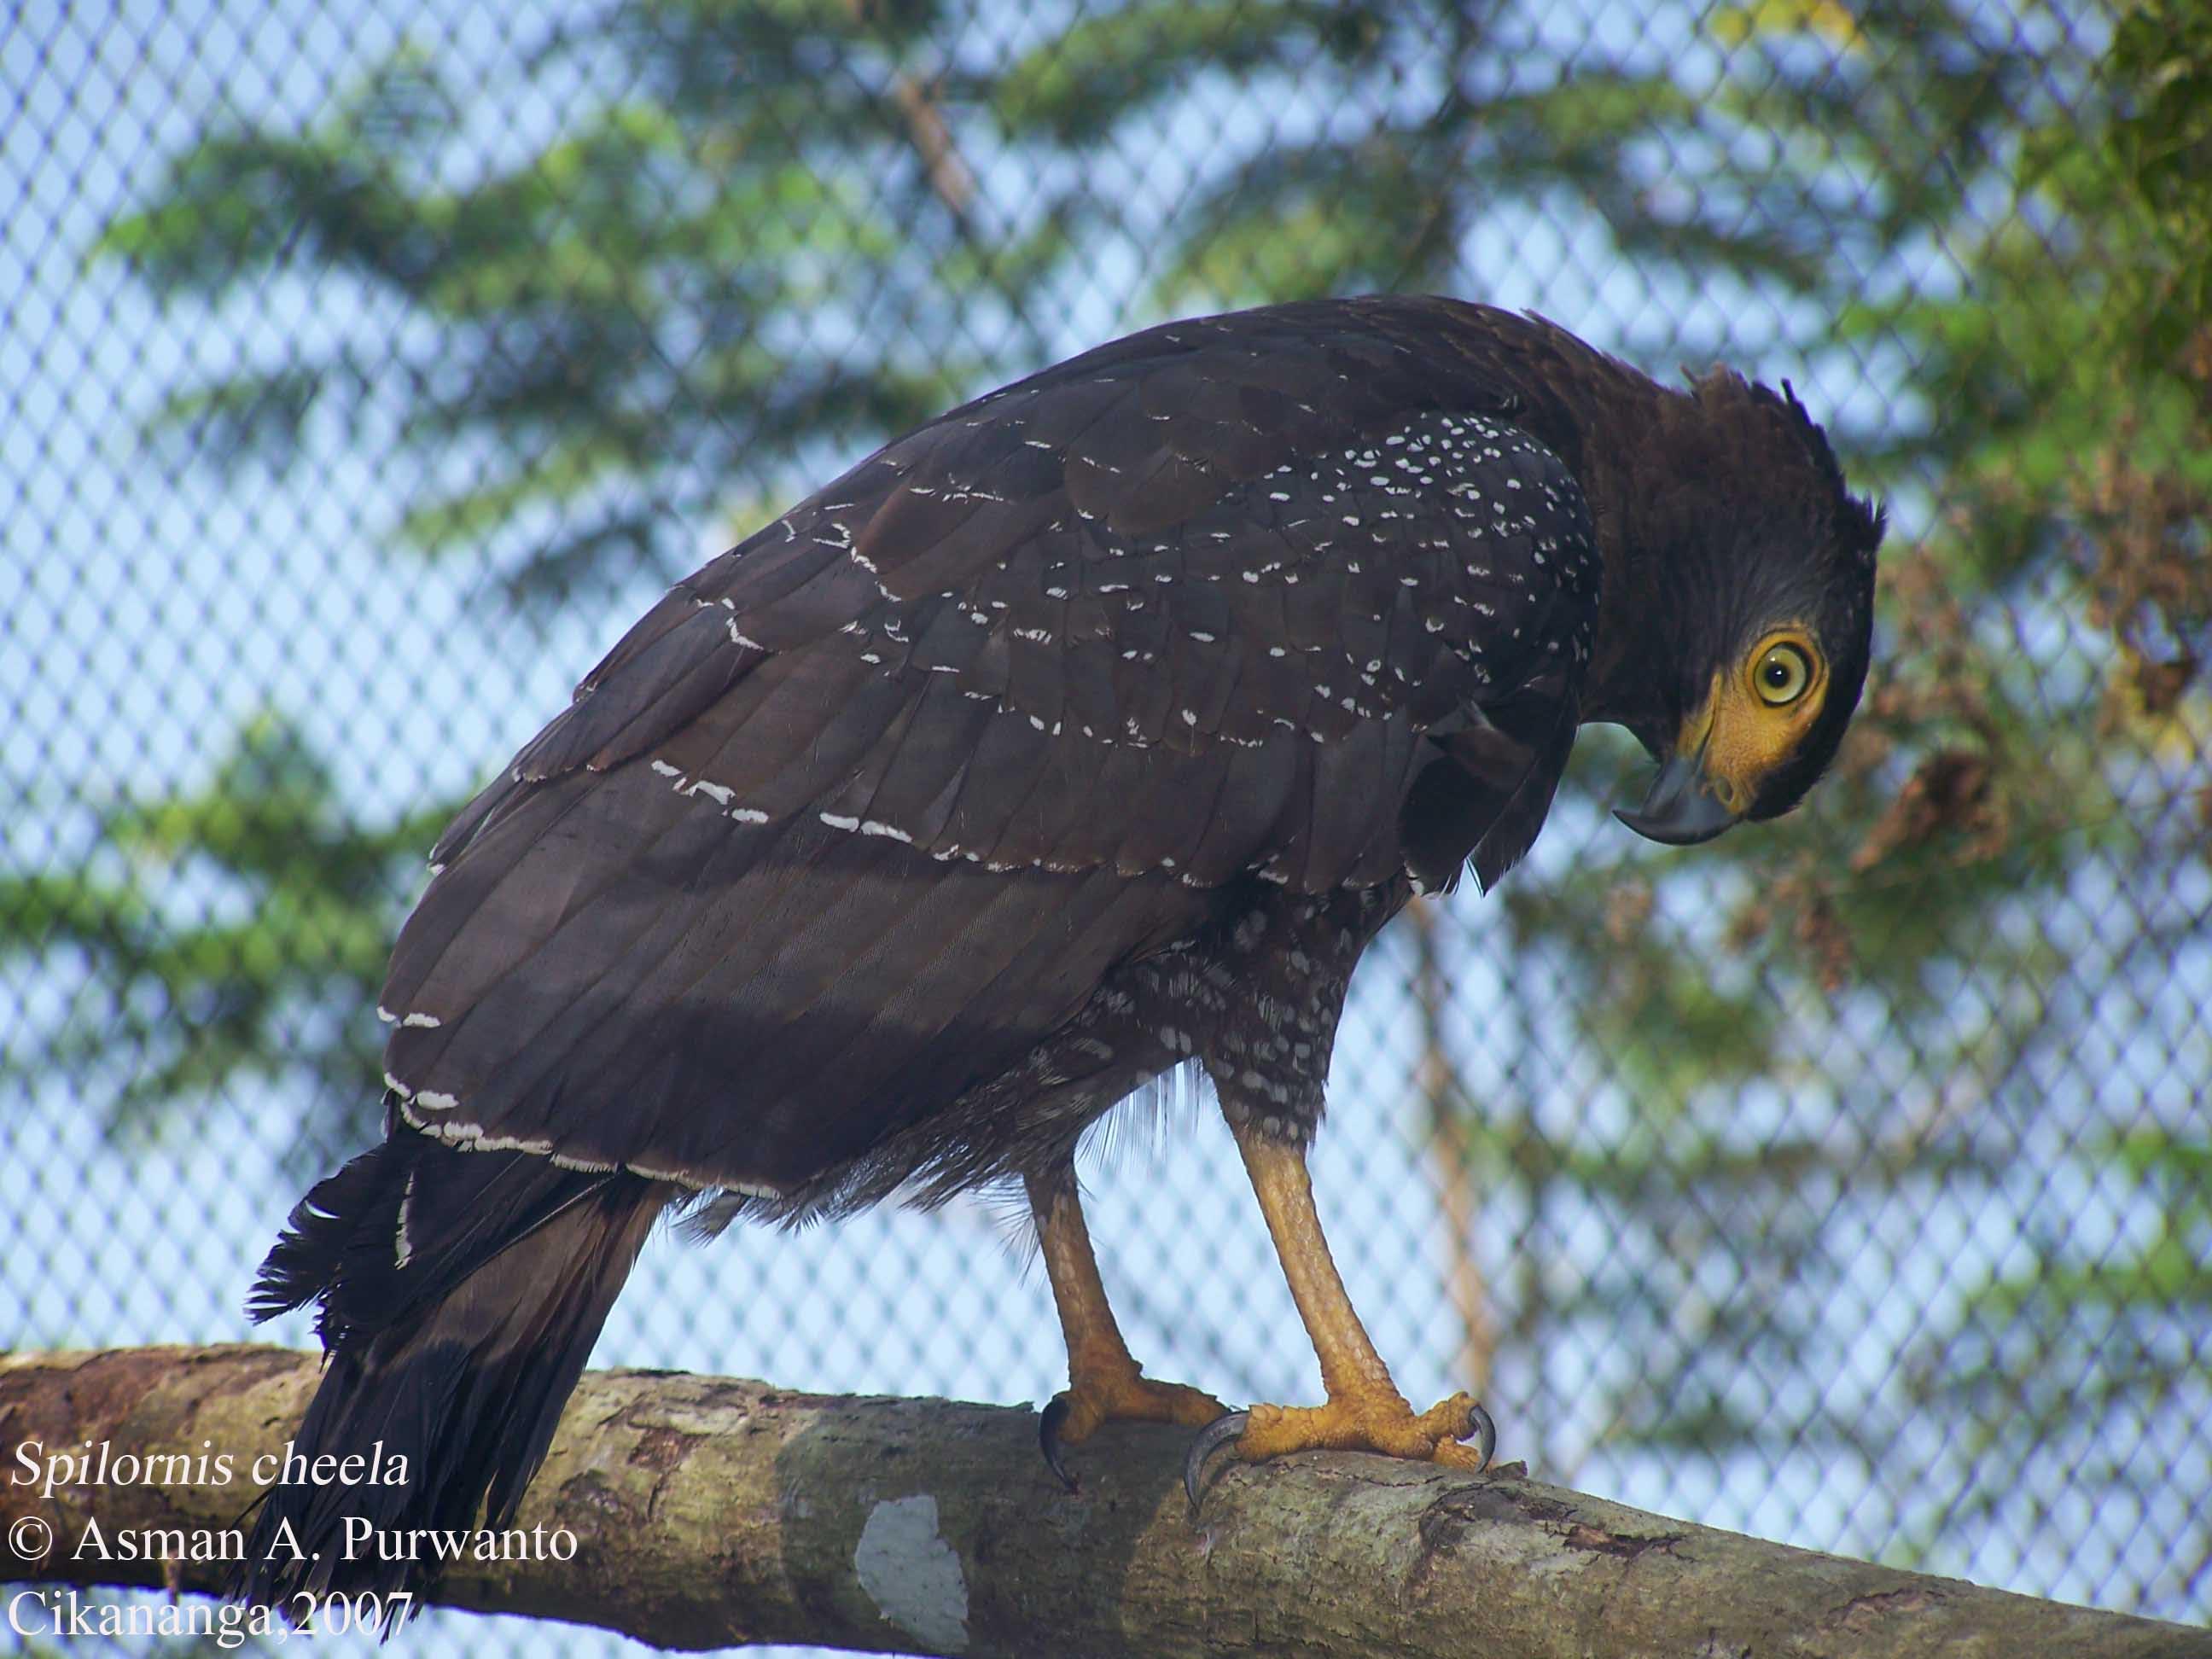 Unduh 94+ Foto Gambar Burung Elang Ular Bido  Terbaru Gratis